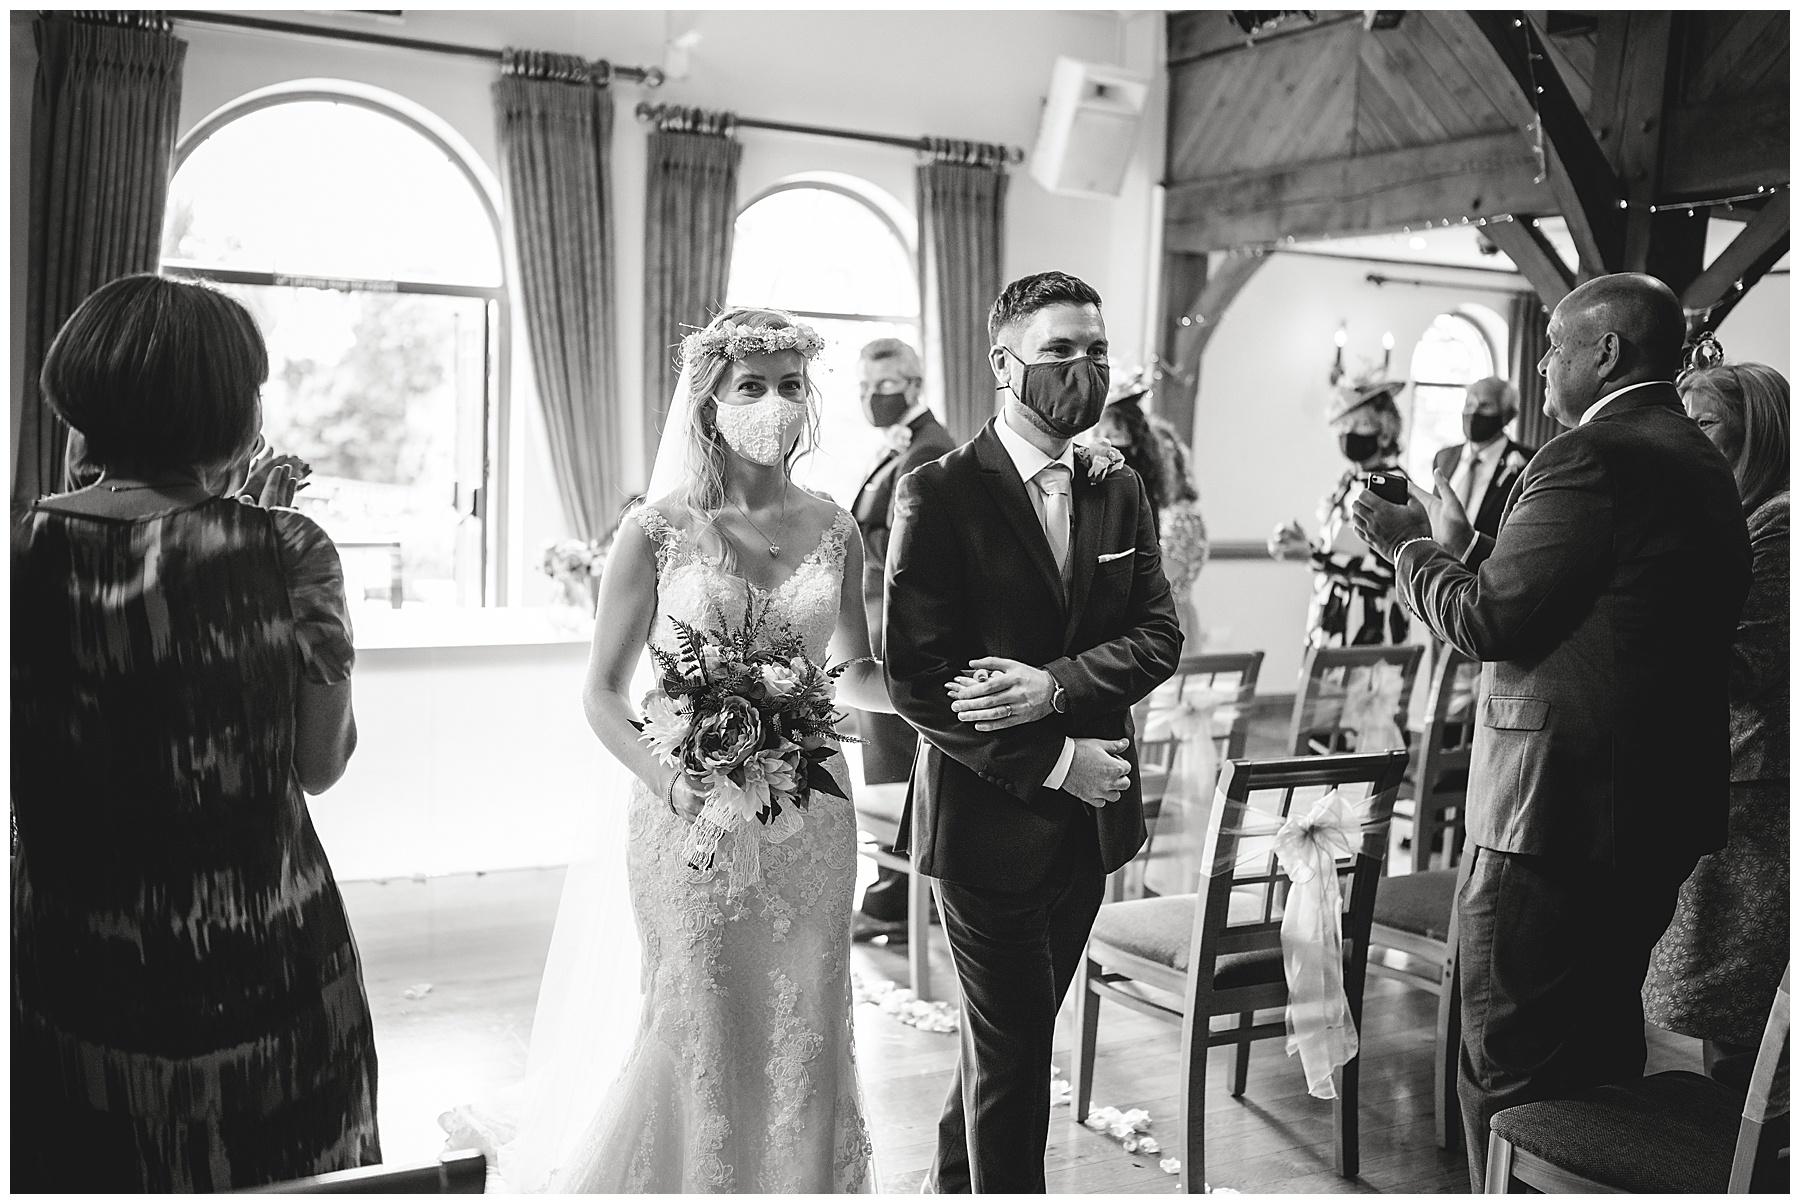 Wedding Ceremony at King Arthur